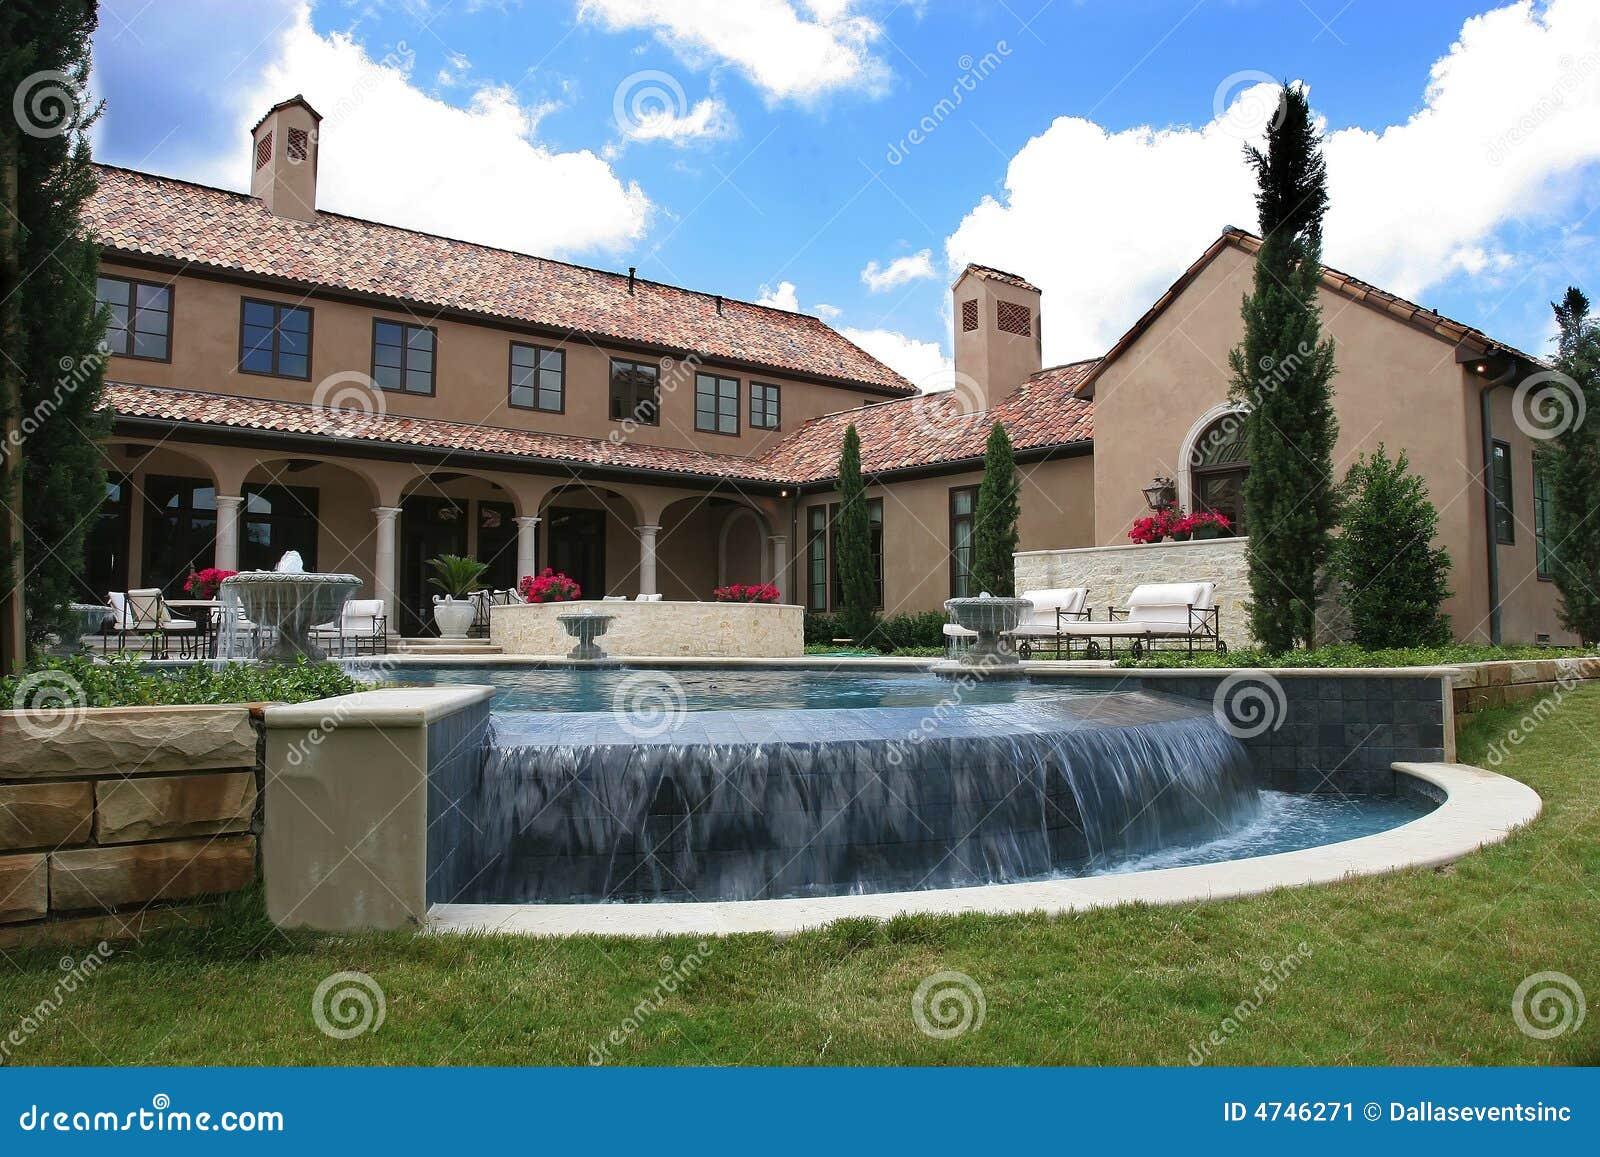 Italian Style Home luxury italian style home and pool stock image - image: 4746271